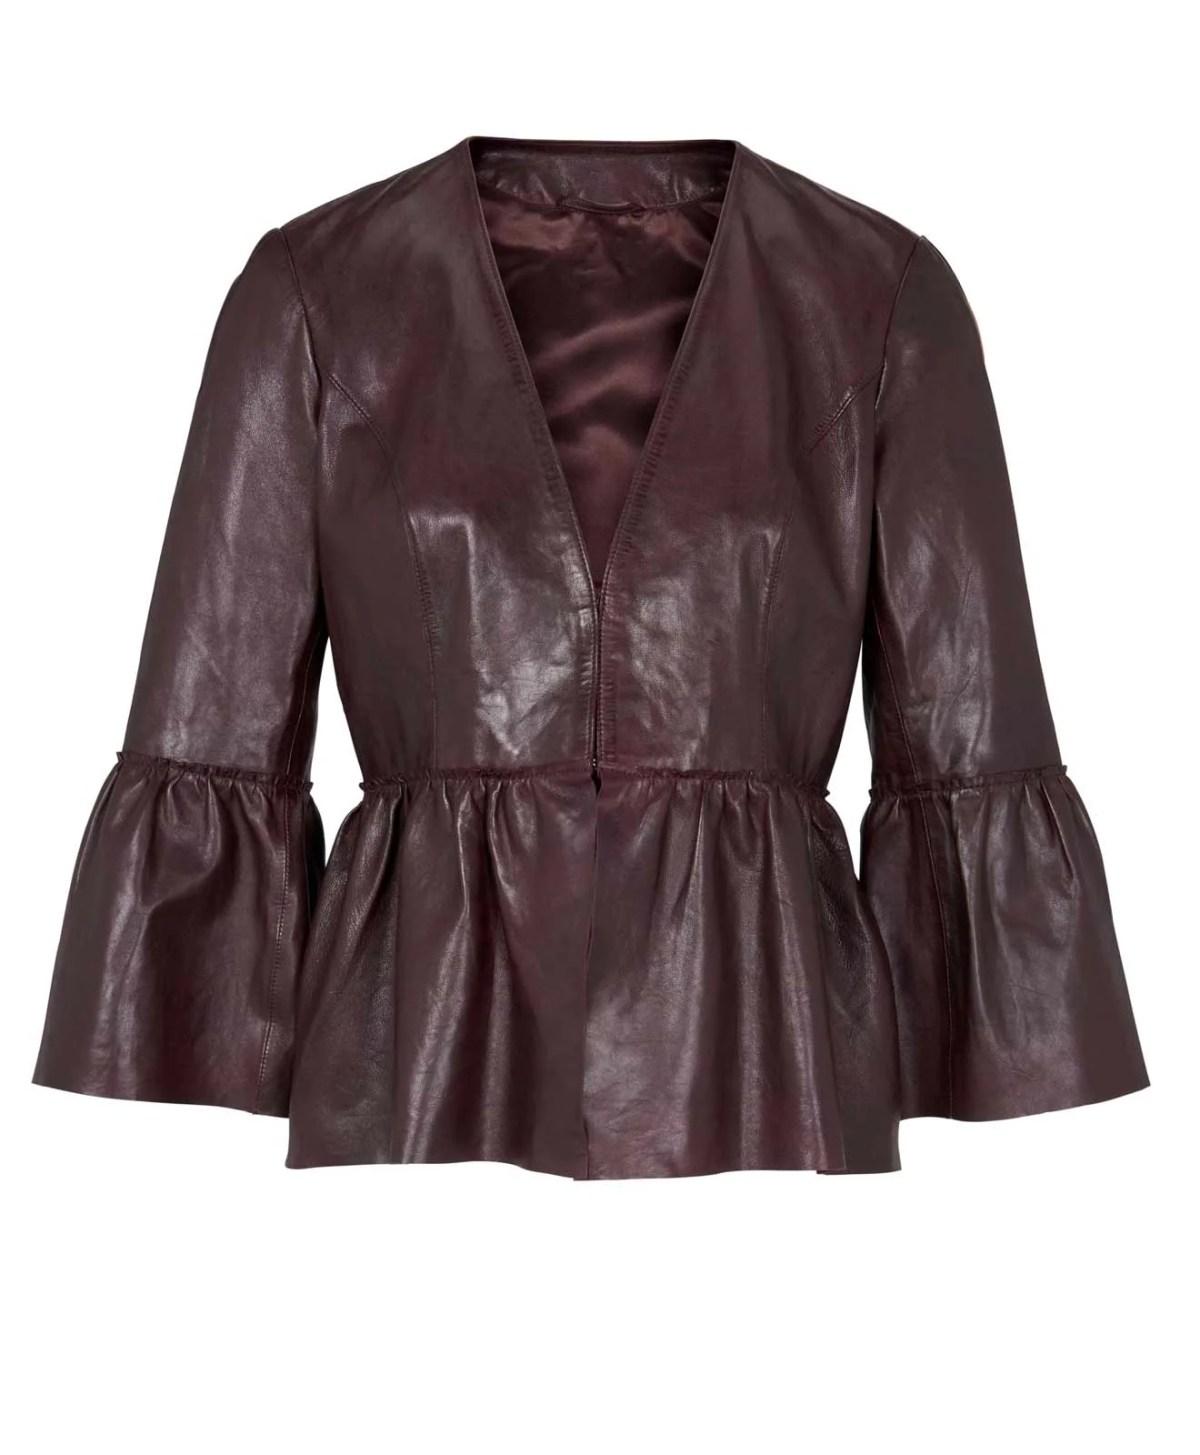 753.830 HEINE Damen Designer-Lammnappalederjacke m. Volants Bordeaux